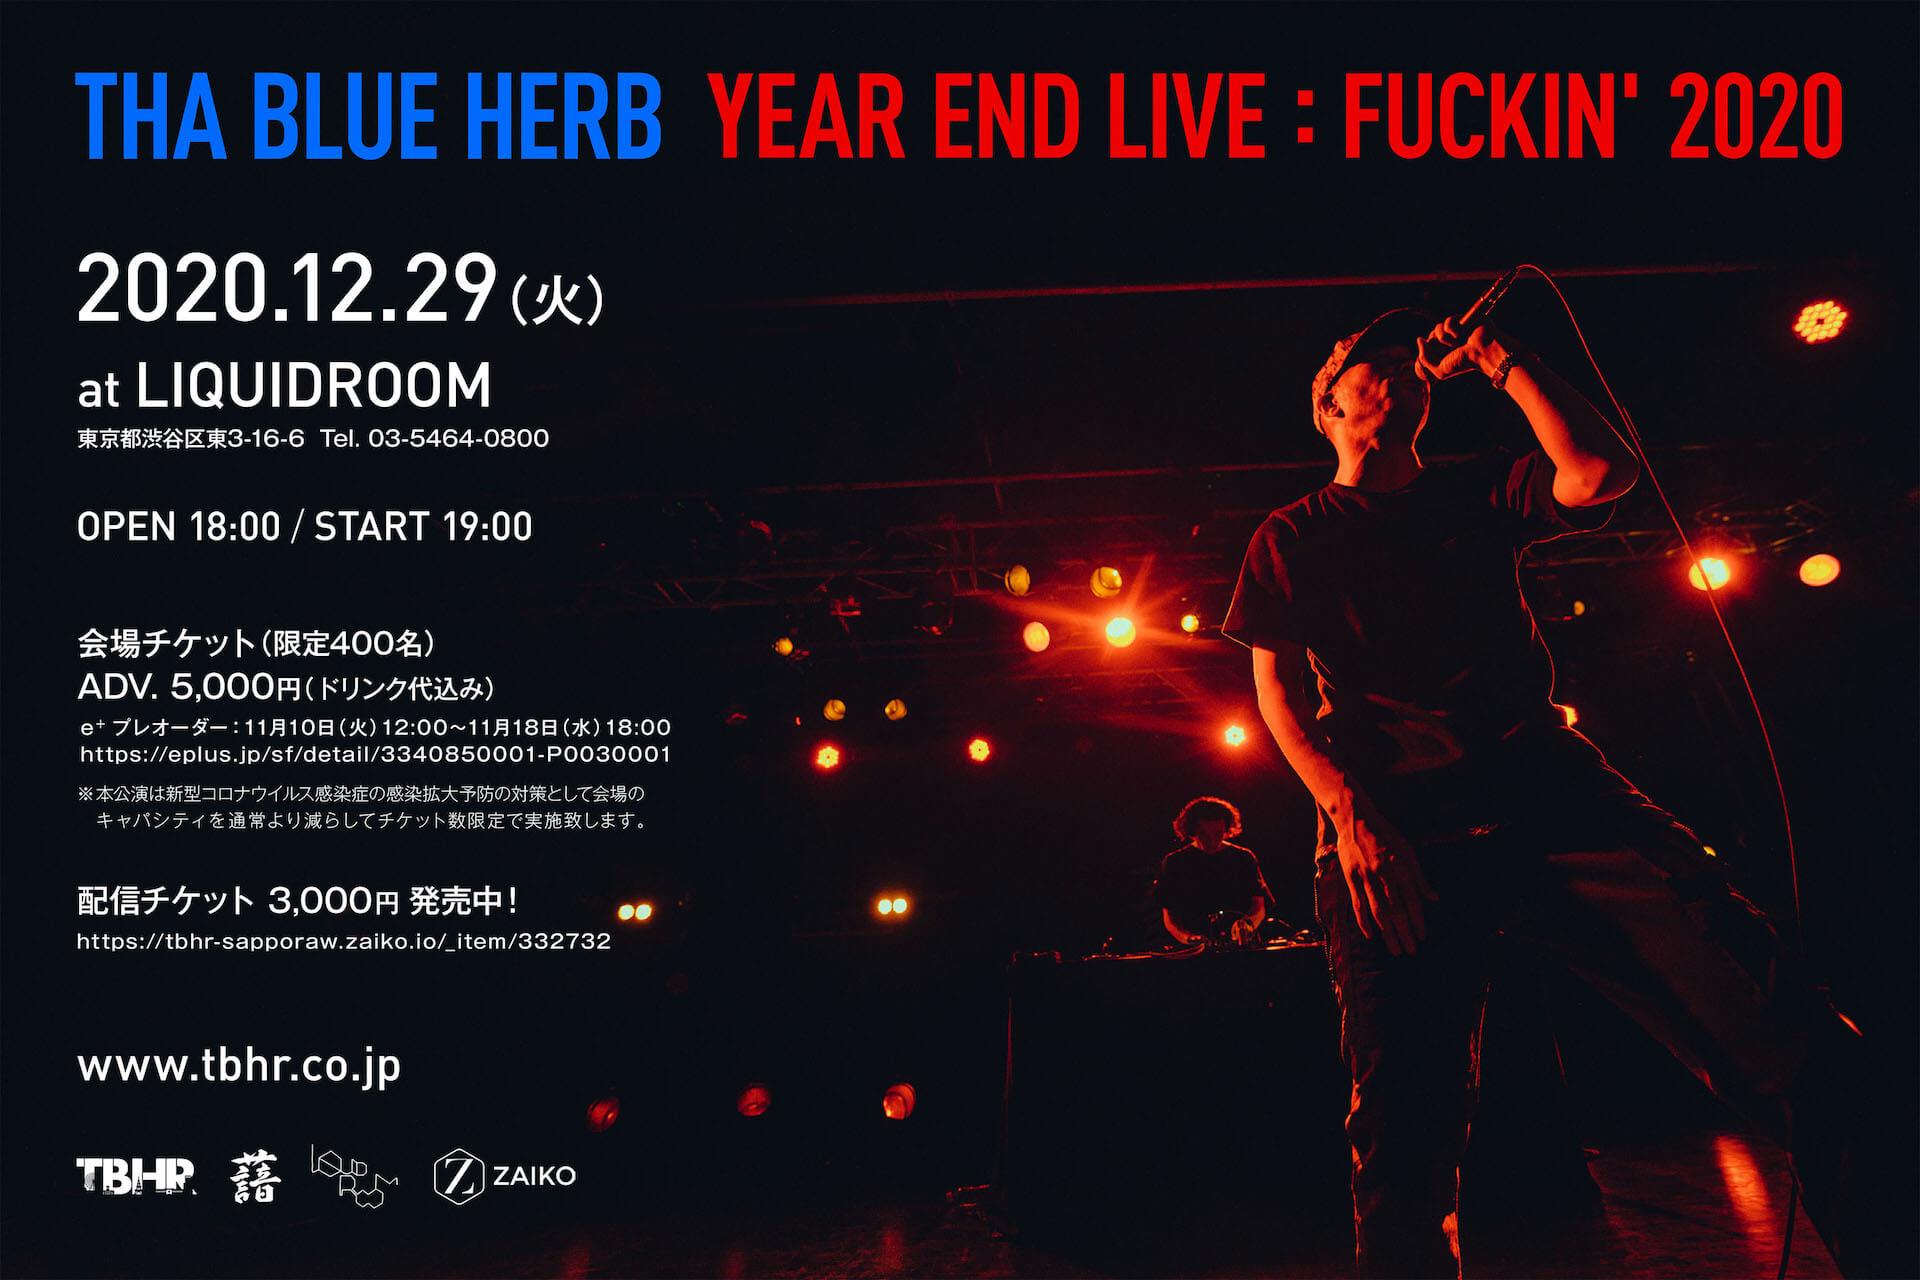 THA BLUE HERBが恒例のワンマンライブをLIQUIDROOMにて開催決定!チケット数限定有観客&配信も実施 music201109_thablueherb_2